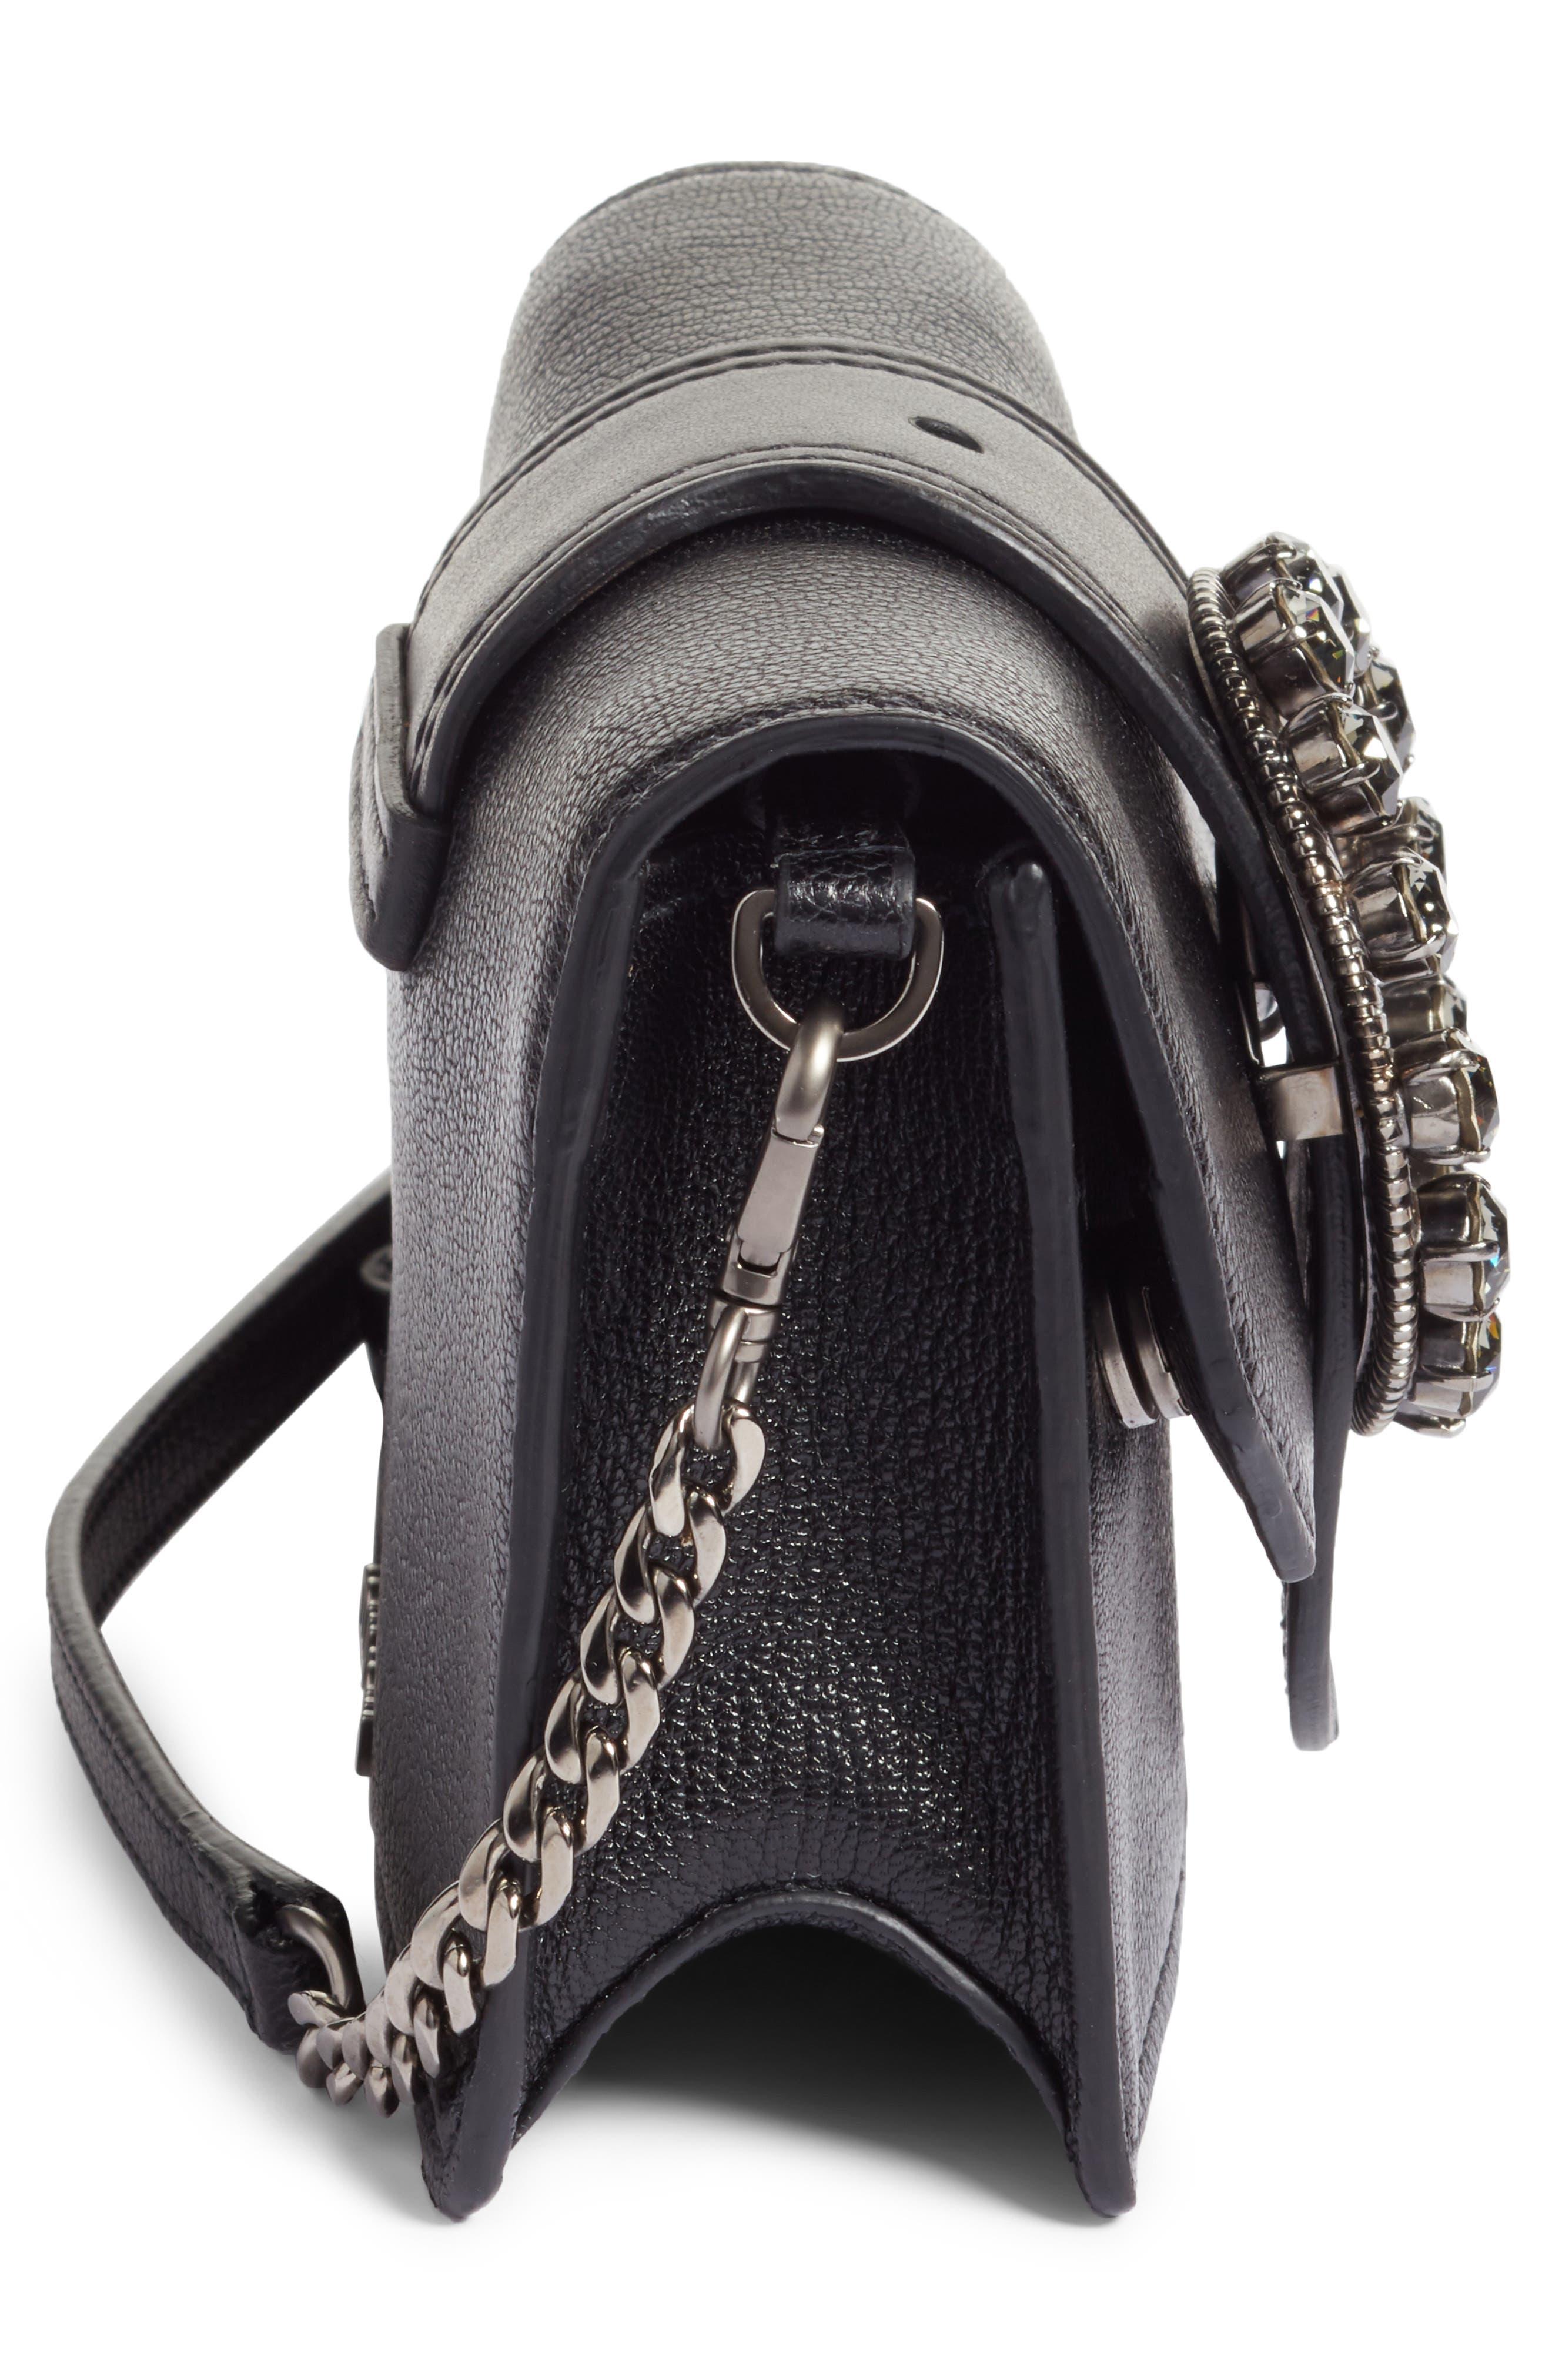 Lady Madras Crystal Embellished Leather Crossbody Bag,                             Alternate thumbnail 5, color,                             Nero 1